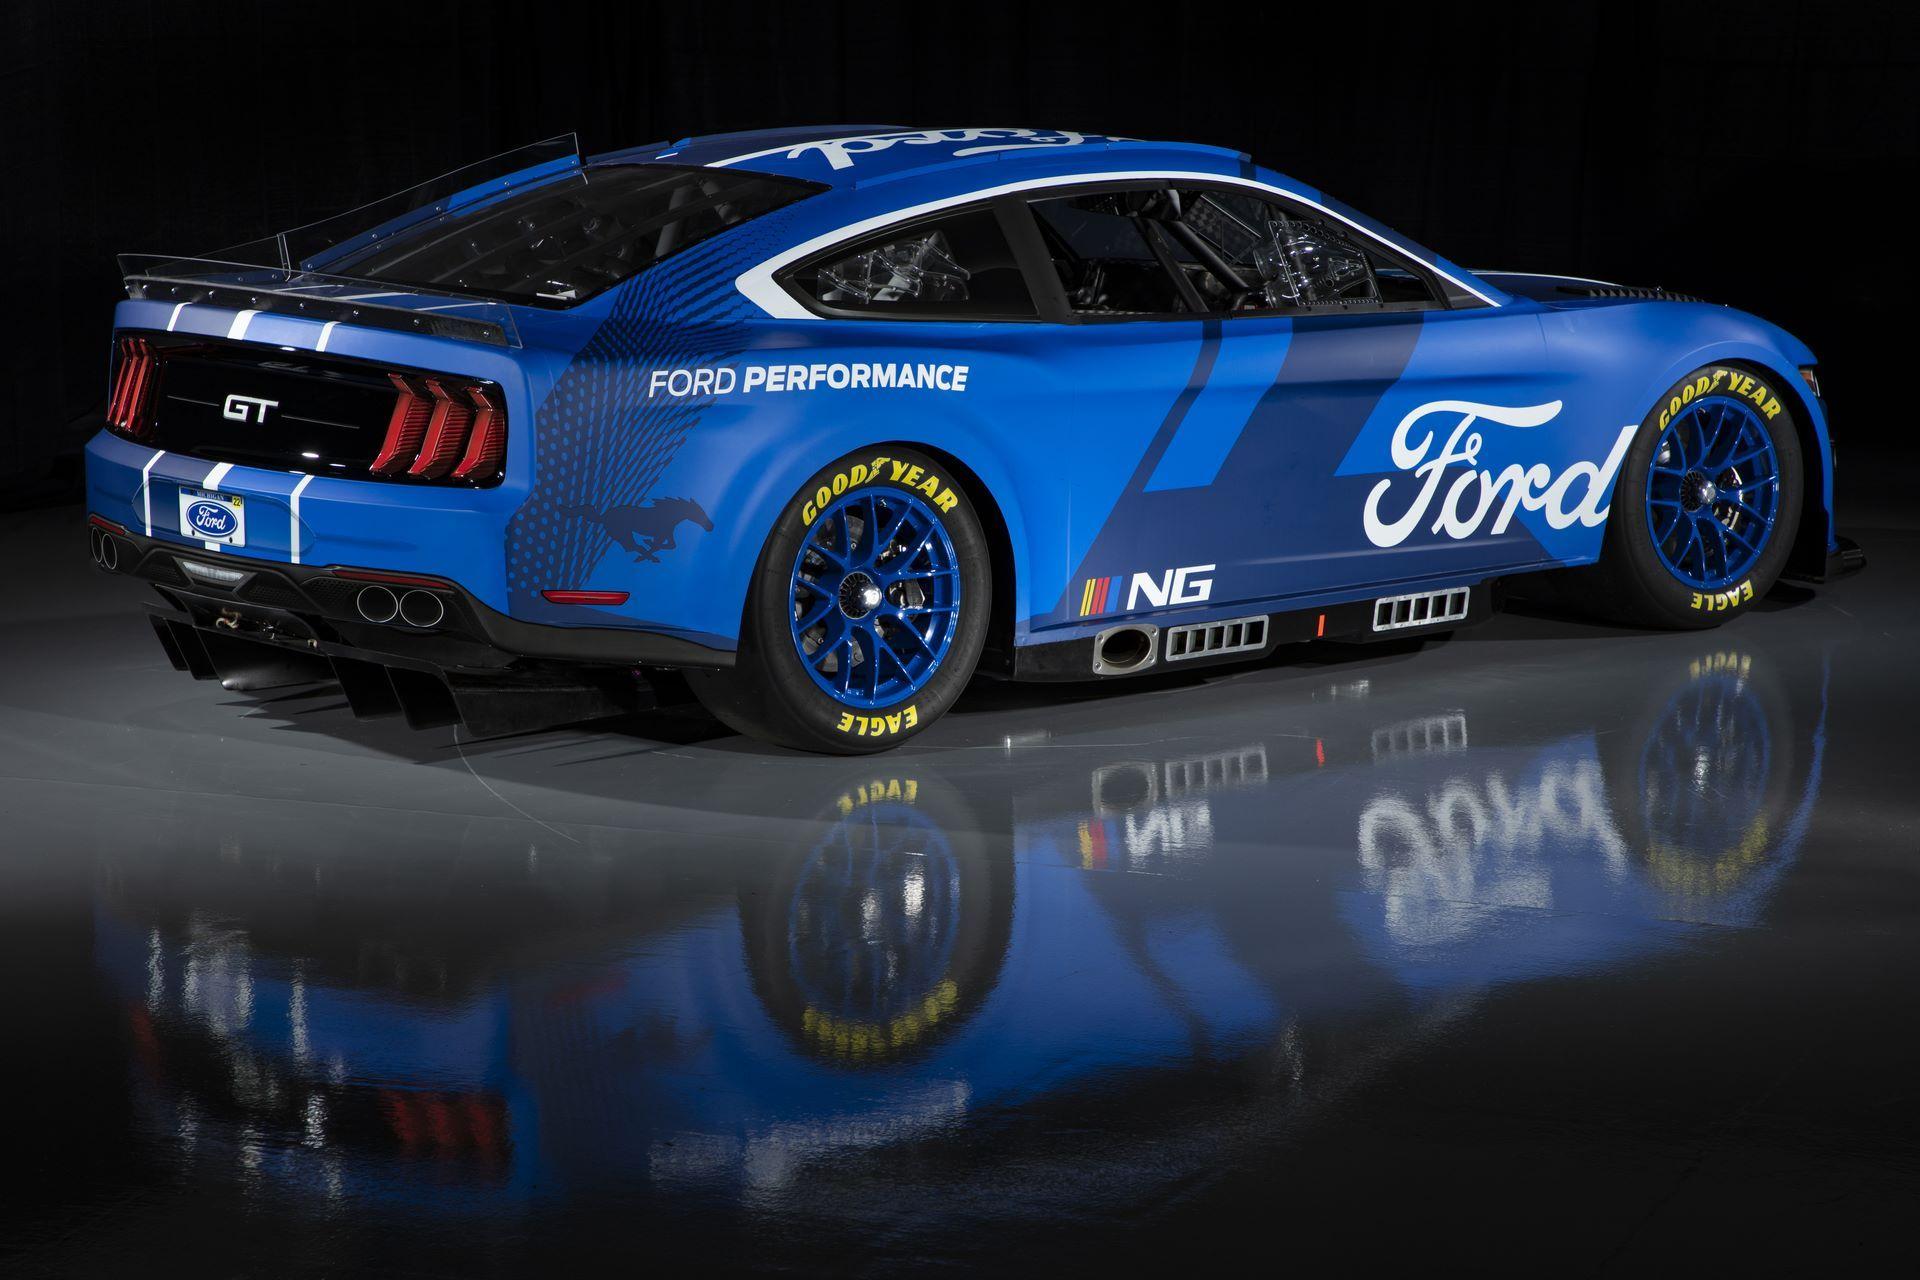 Ford-Mustang-Next-Gen-Nascar-20